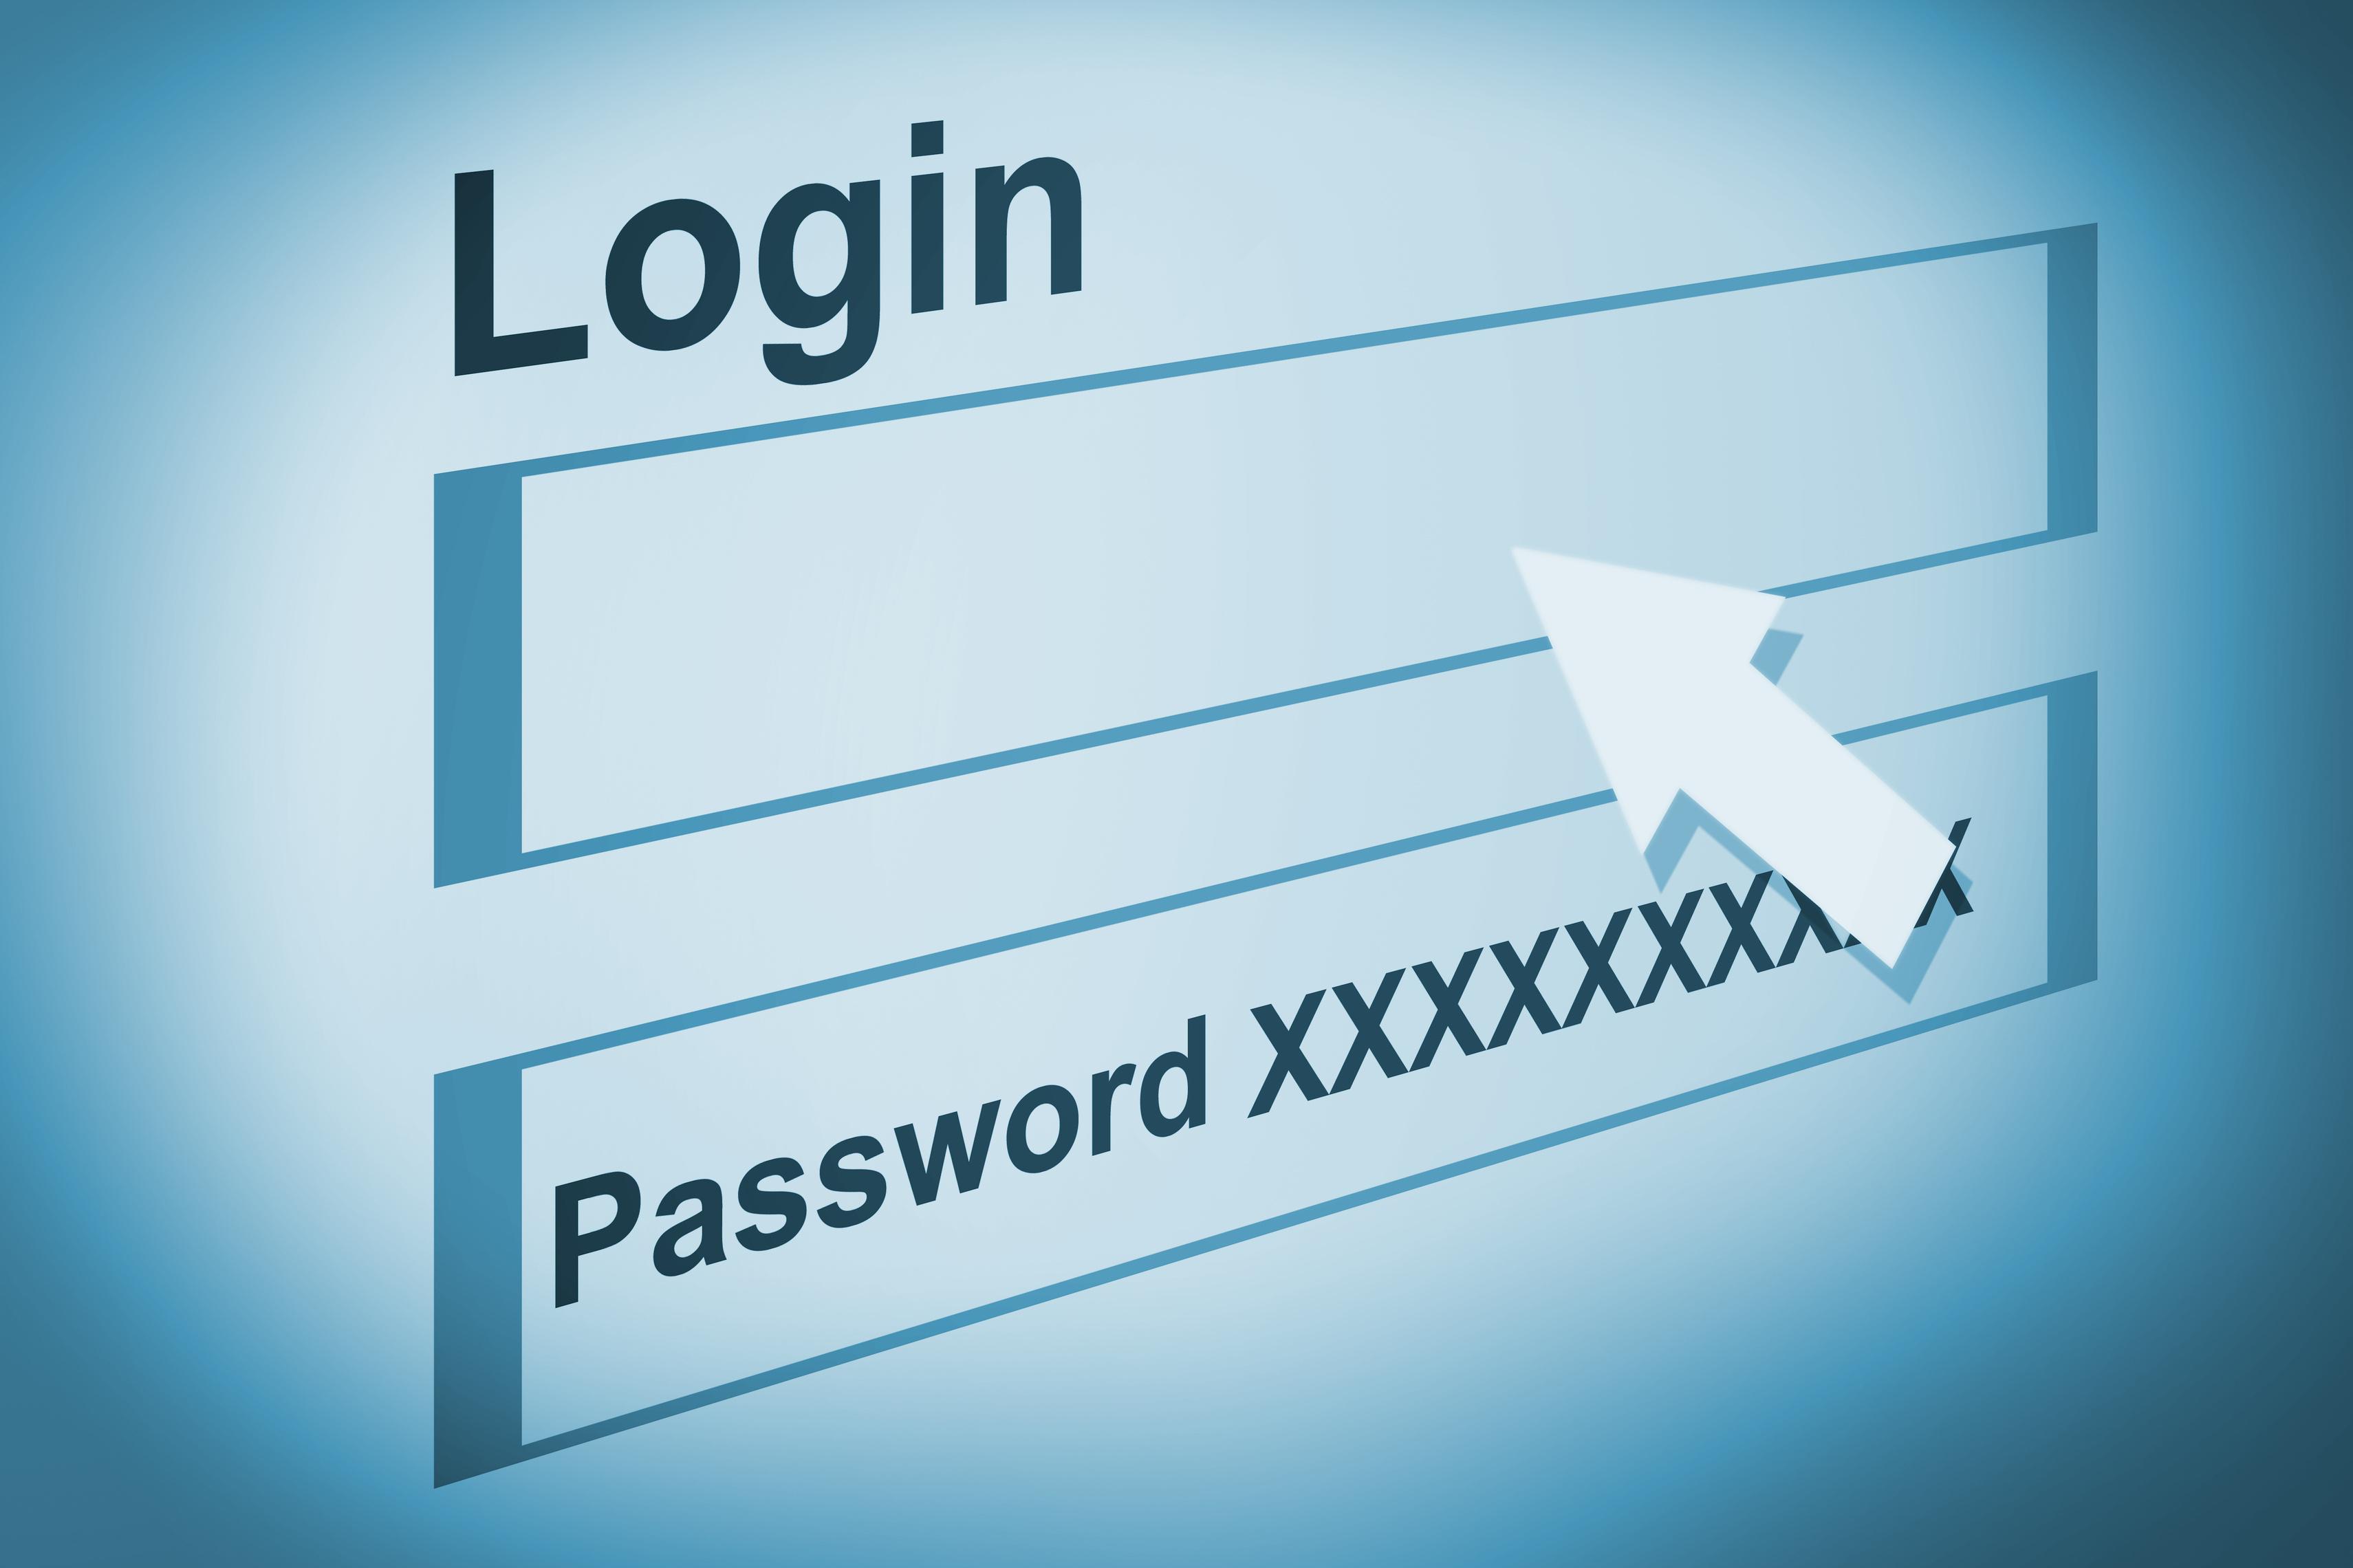 L'autenticazione via password avrà vita breve